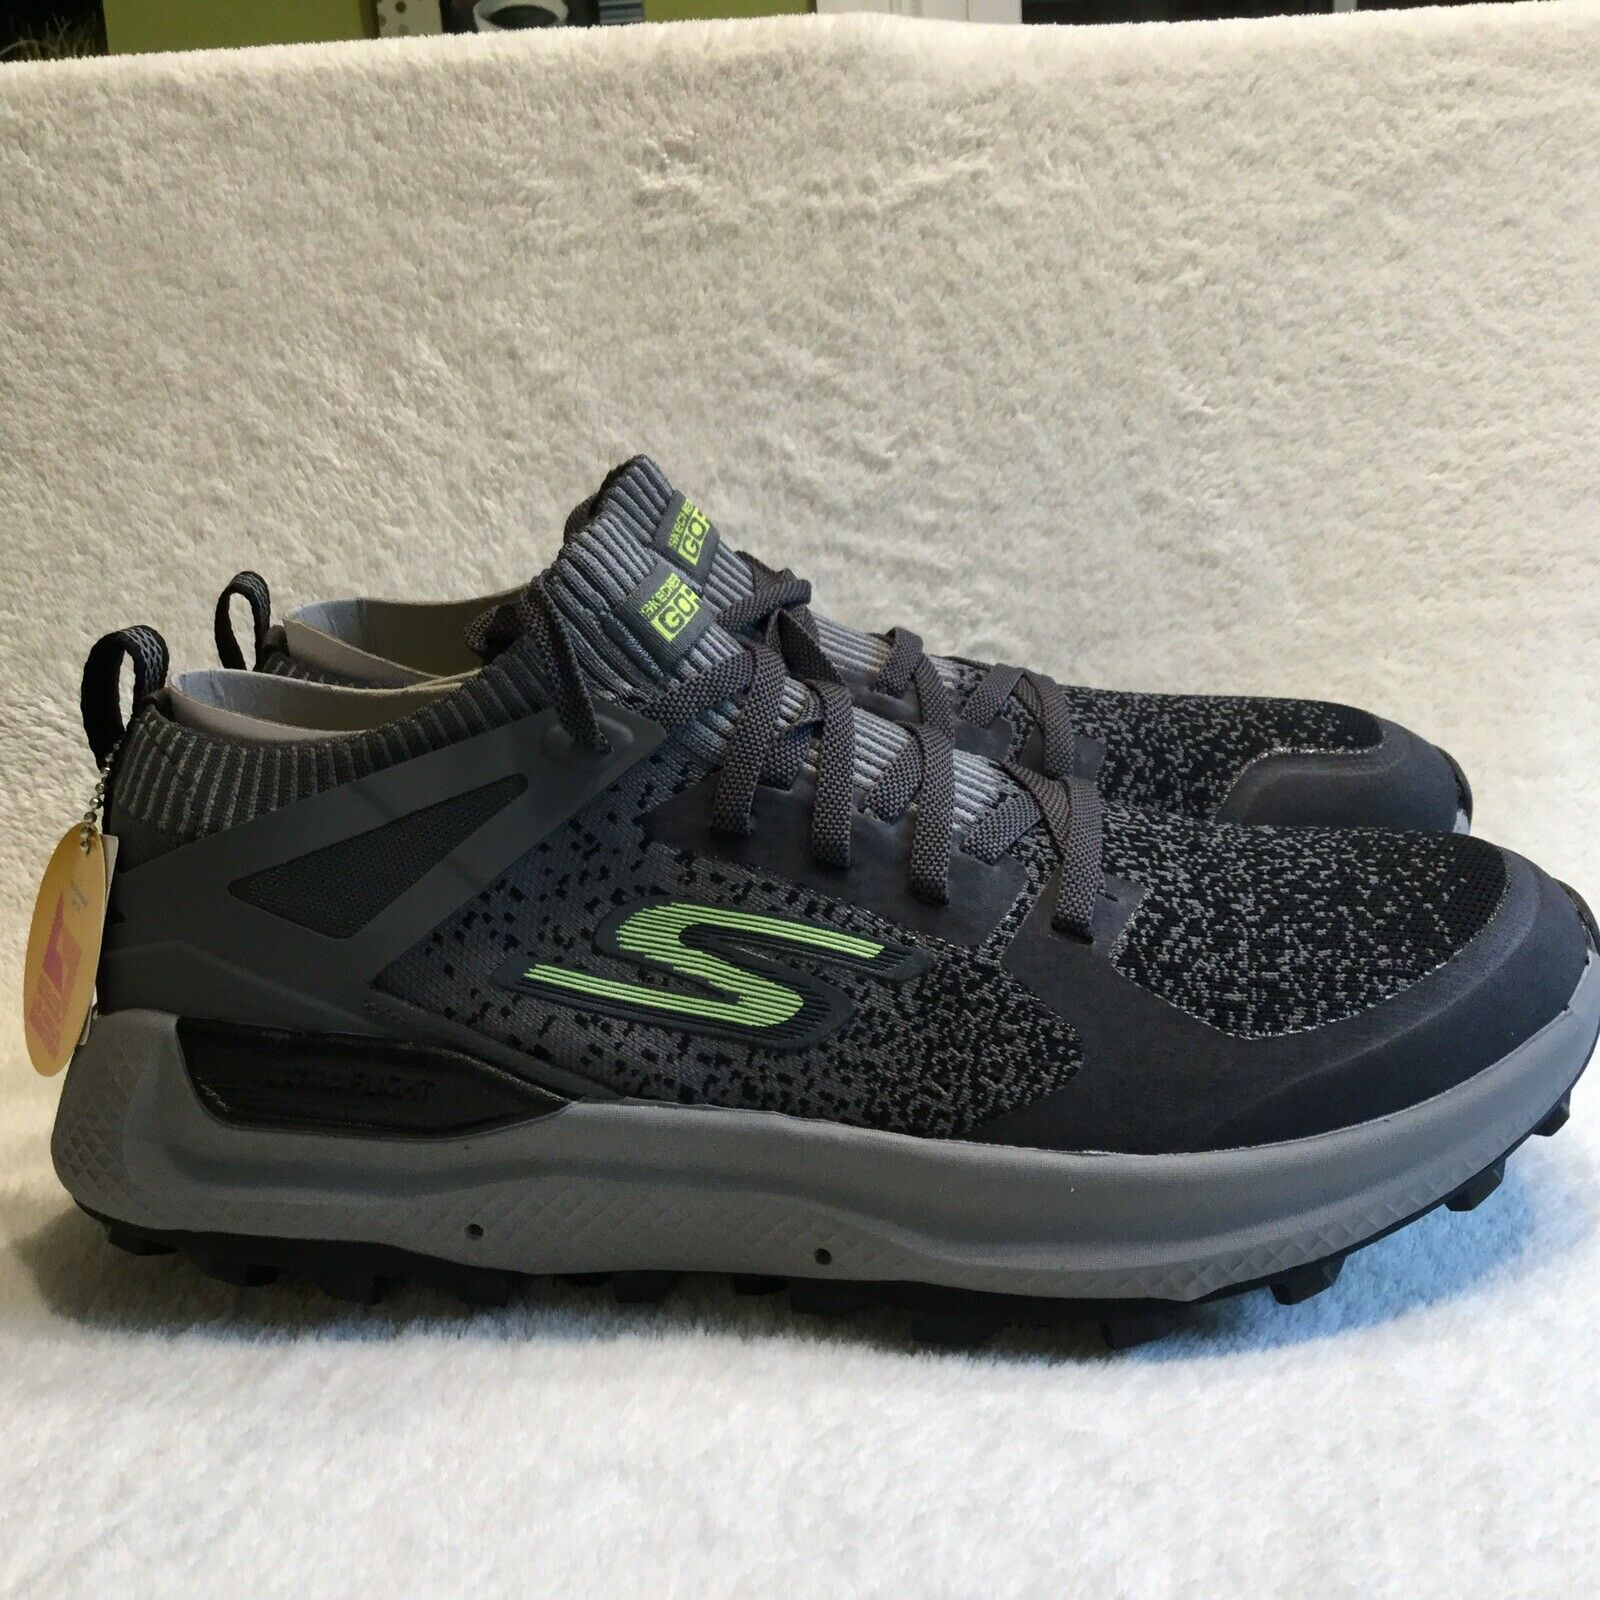 Skechers gorun Max Trail MaxTrail 5 Ultra 55207 CCLM Running zapatos gris 10.5